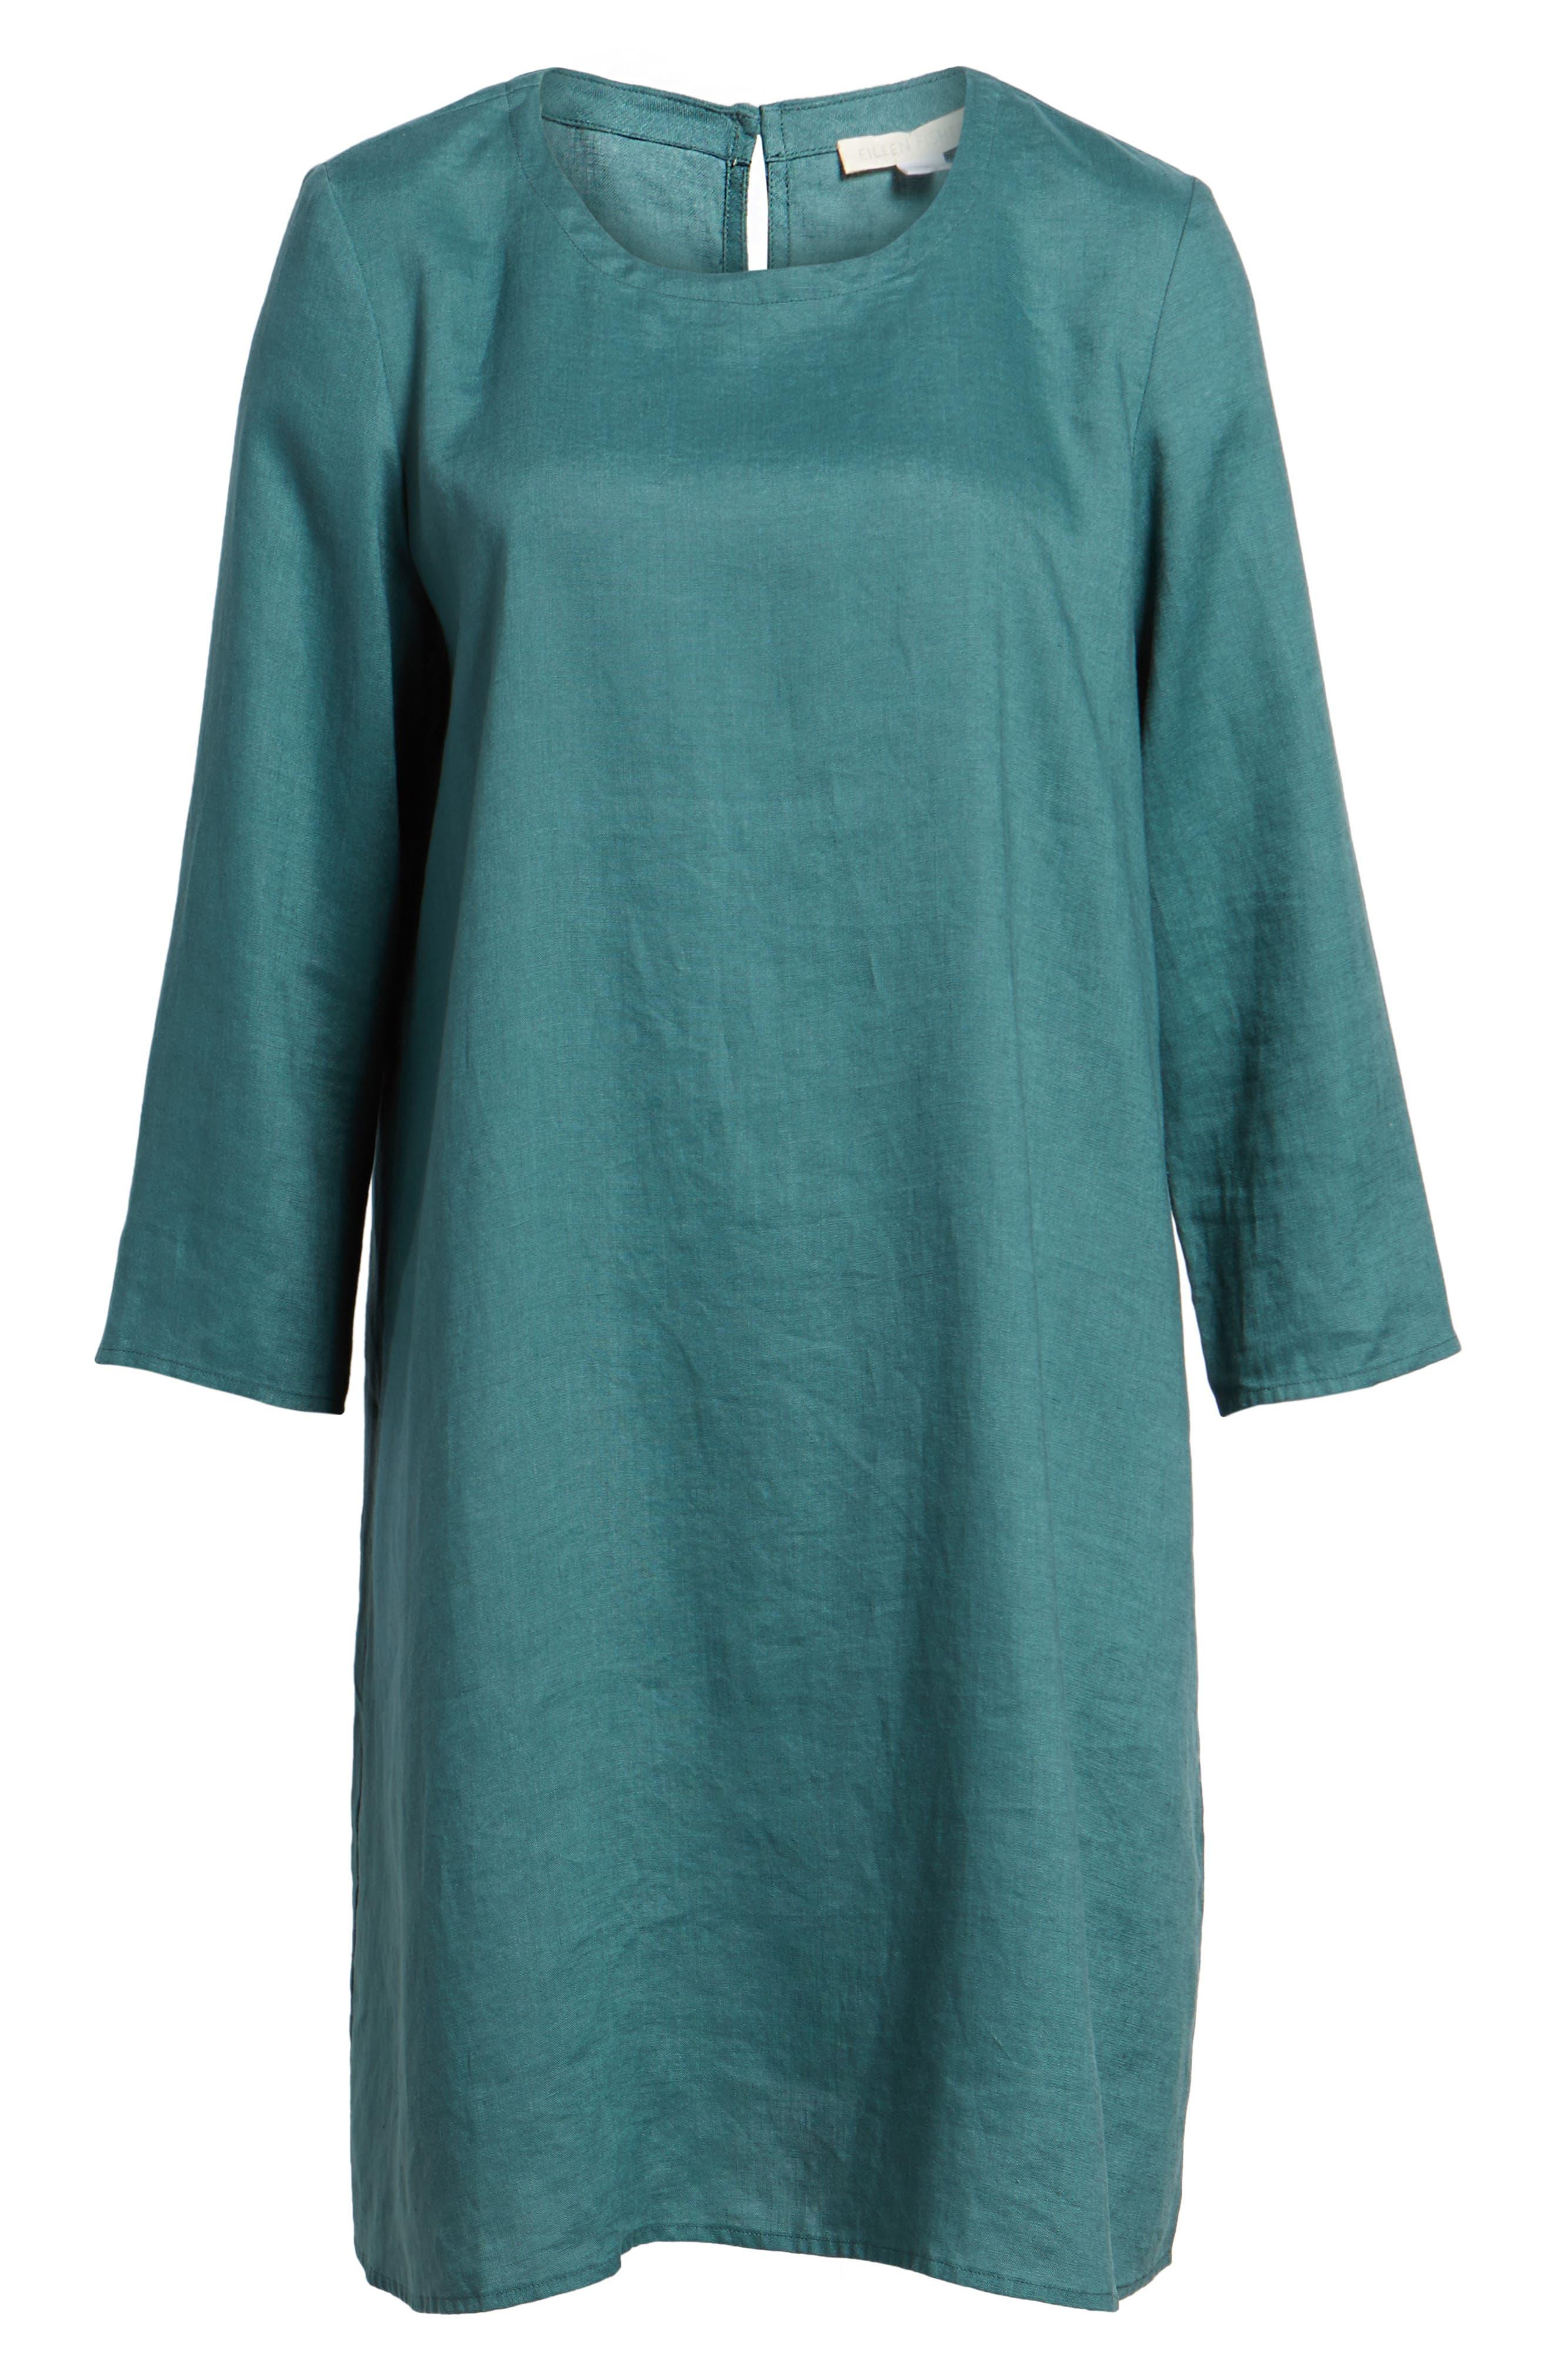 Organic Linen Round Neck Shift Dress,                             Alternate thumbnail 6, color,                             Dragonfly